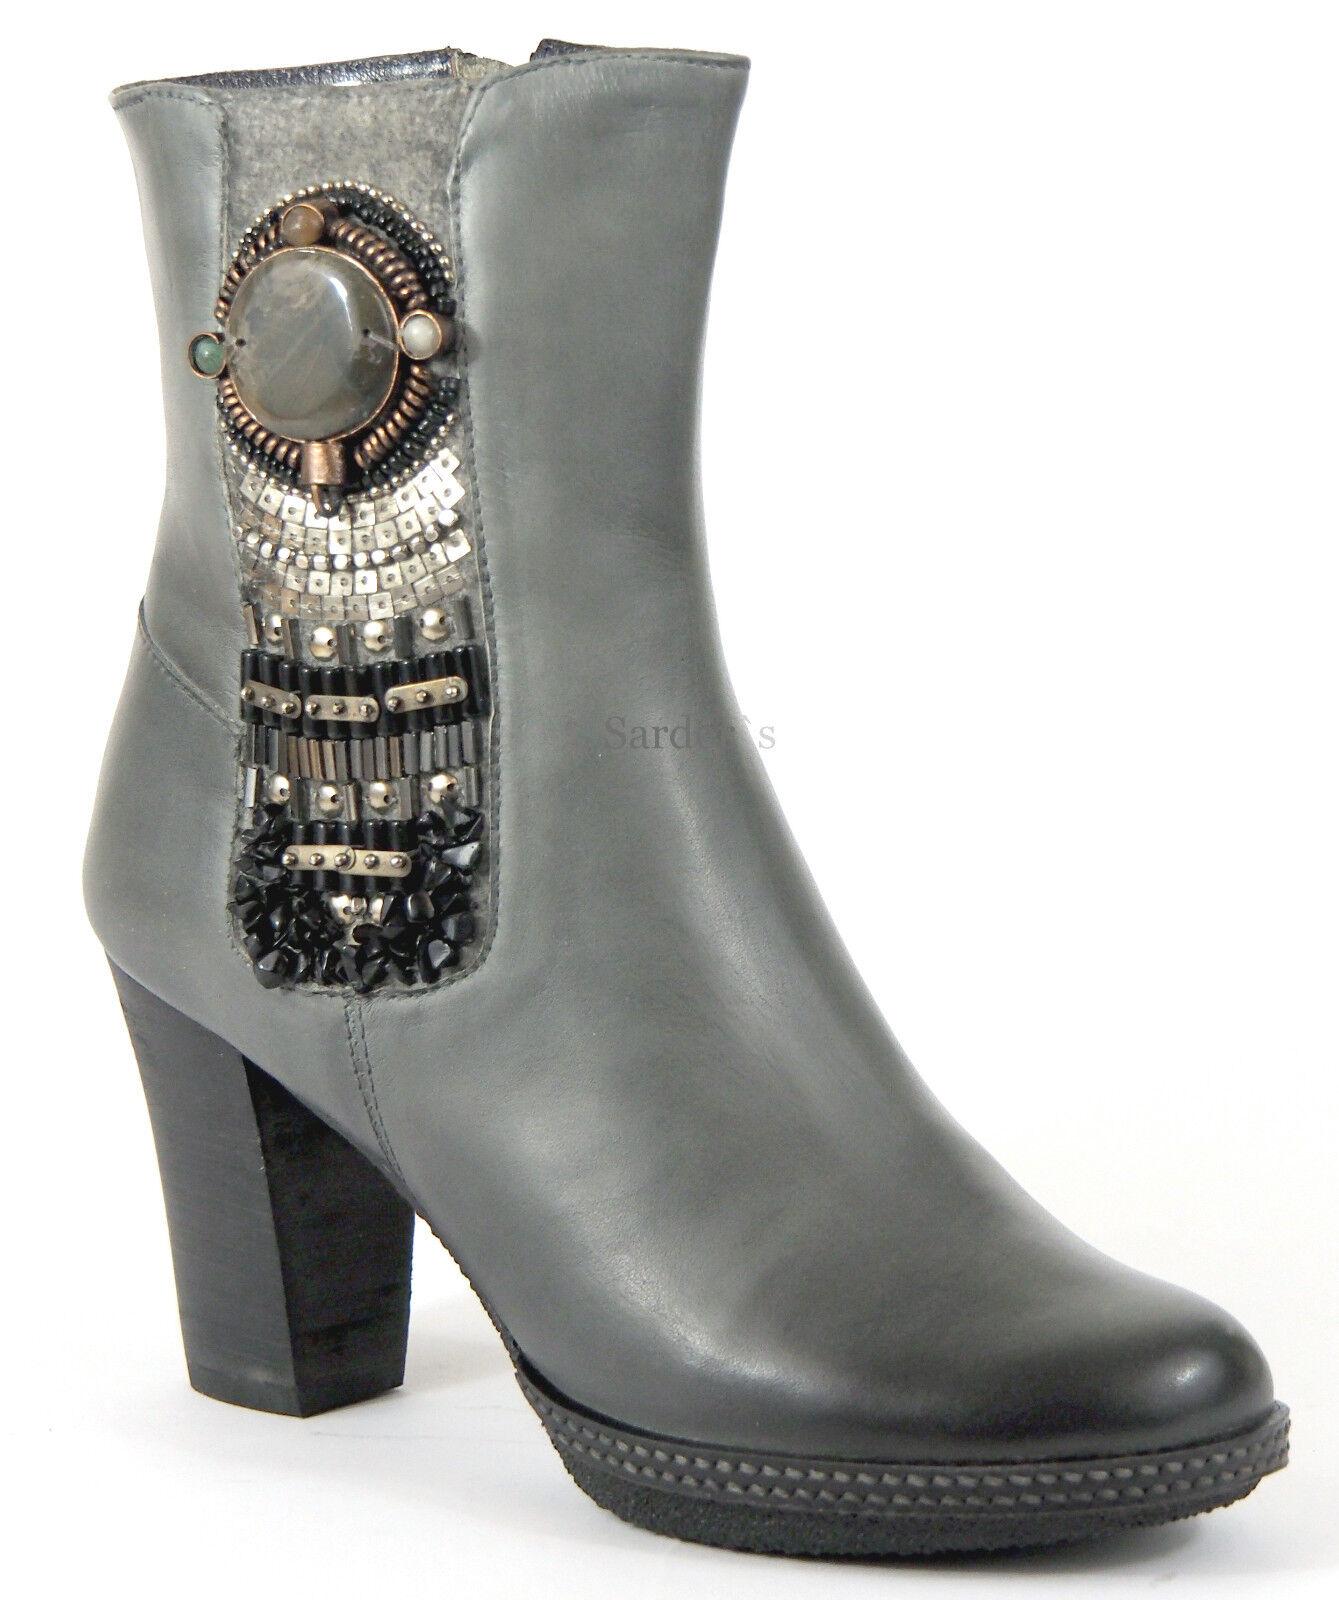 XYXYX Stiefelette 38 Nappa LEDER grey Used Boots Plateau Heels Schuh Schmuck NEU